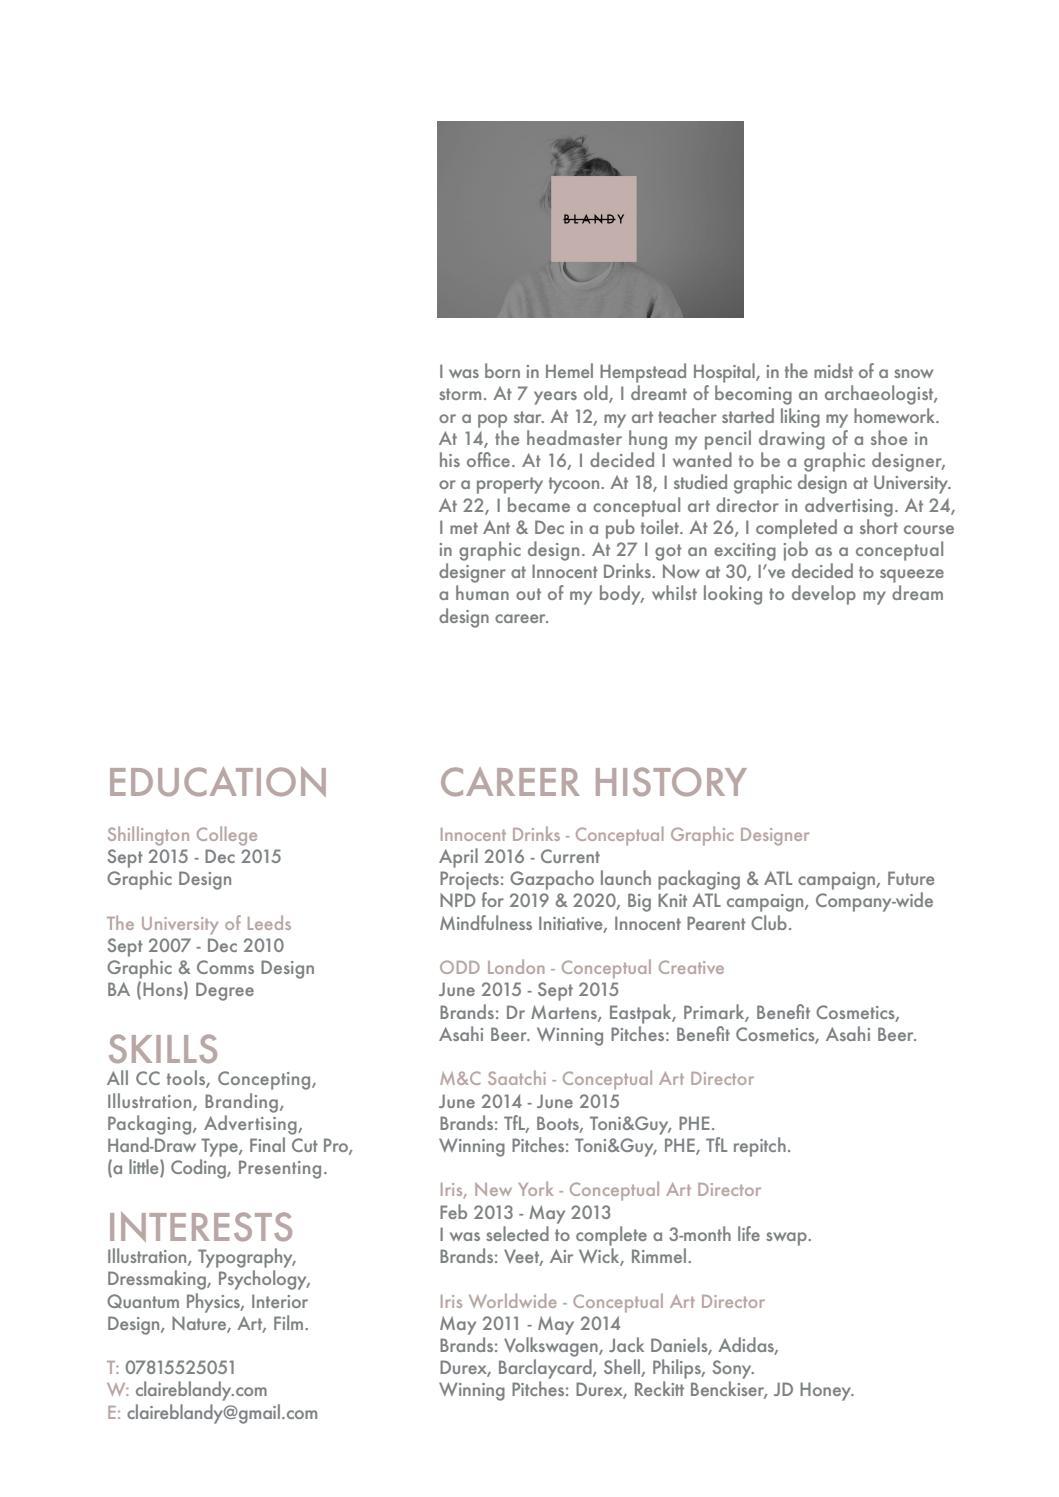 CV Claire Blandy by claireblandy - issuu